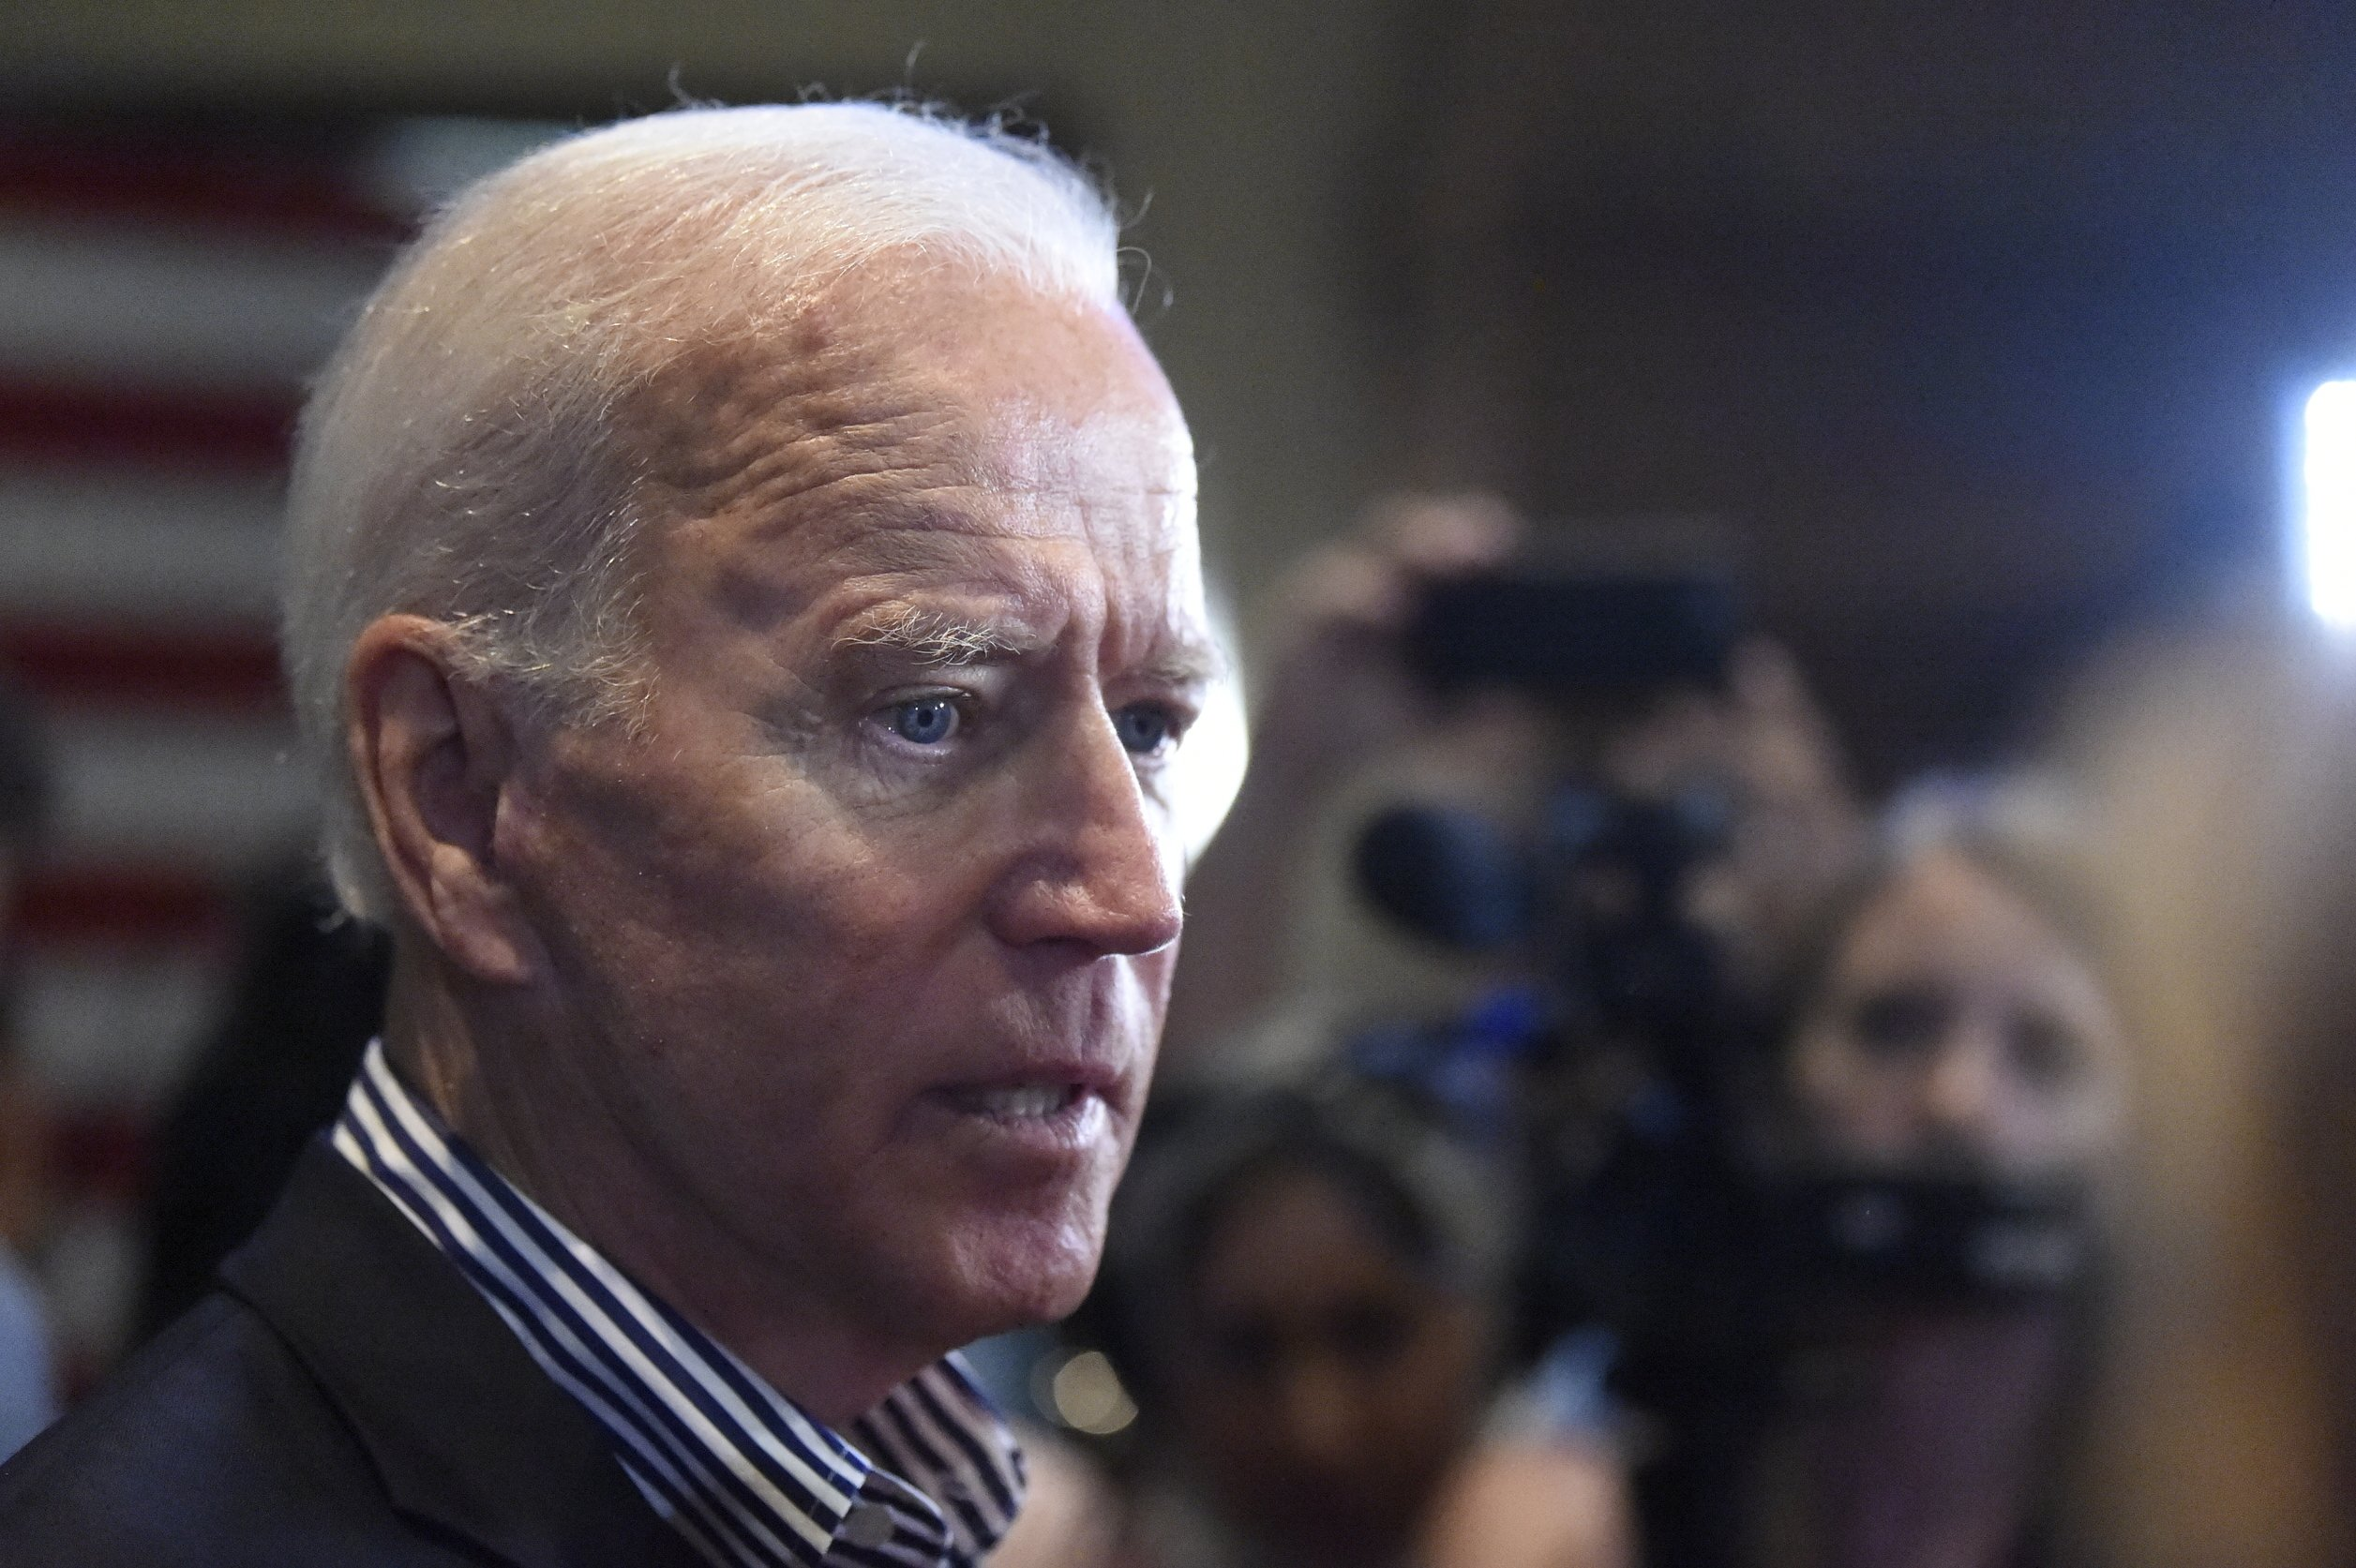 Biden Opens New Attack Line On Trump Cruelty To Children